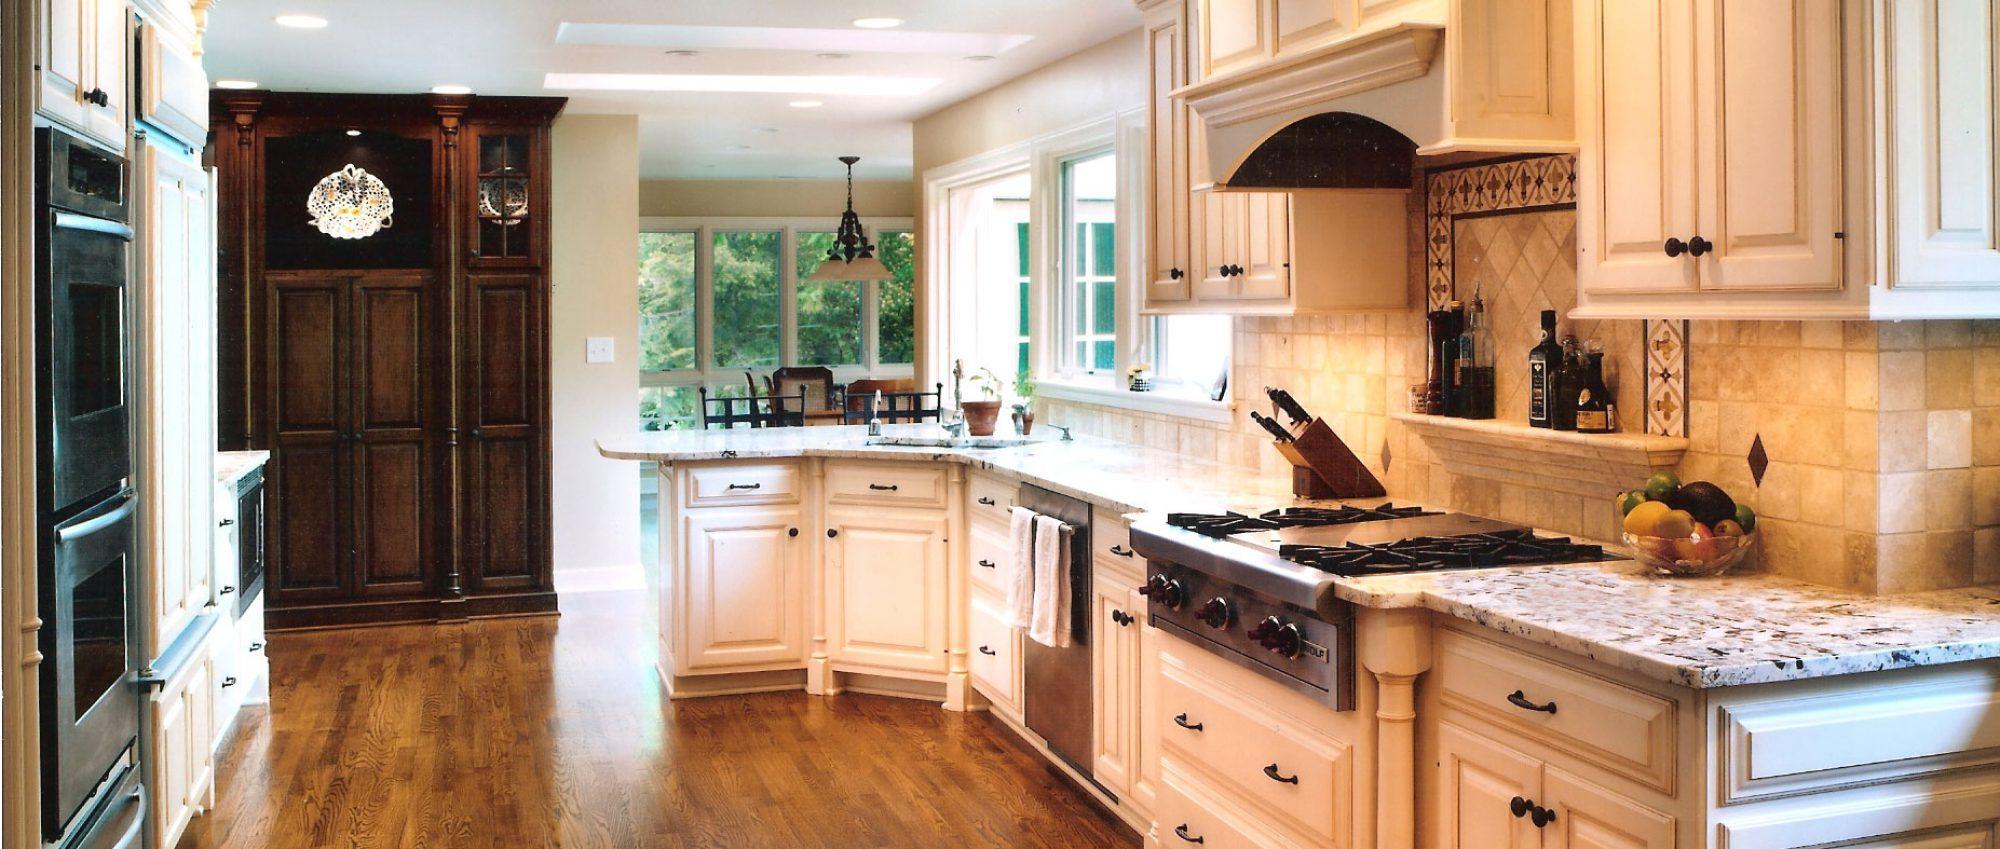 Old World Kitchen Cabinets Remodel